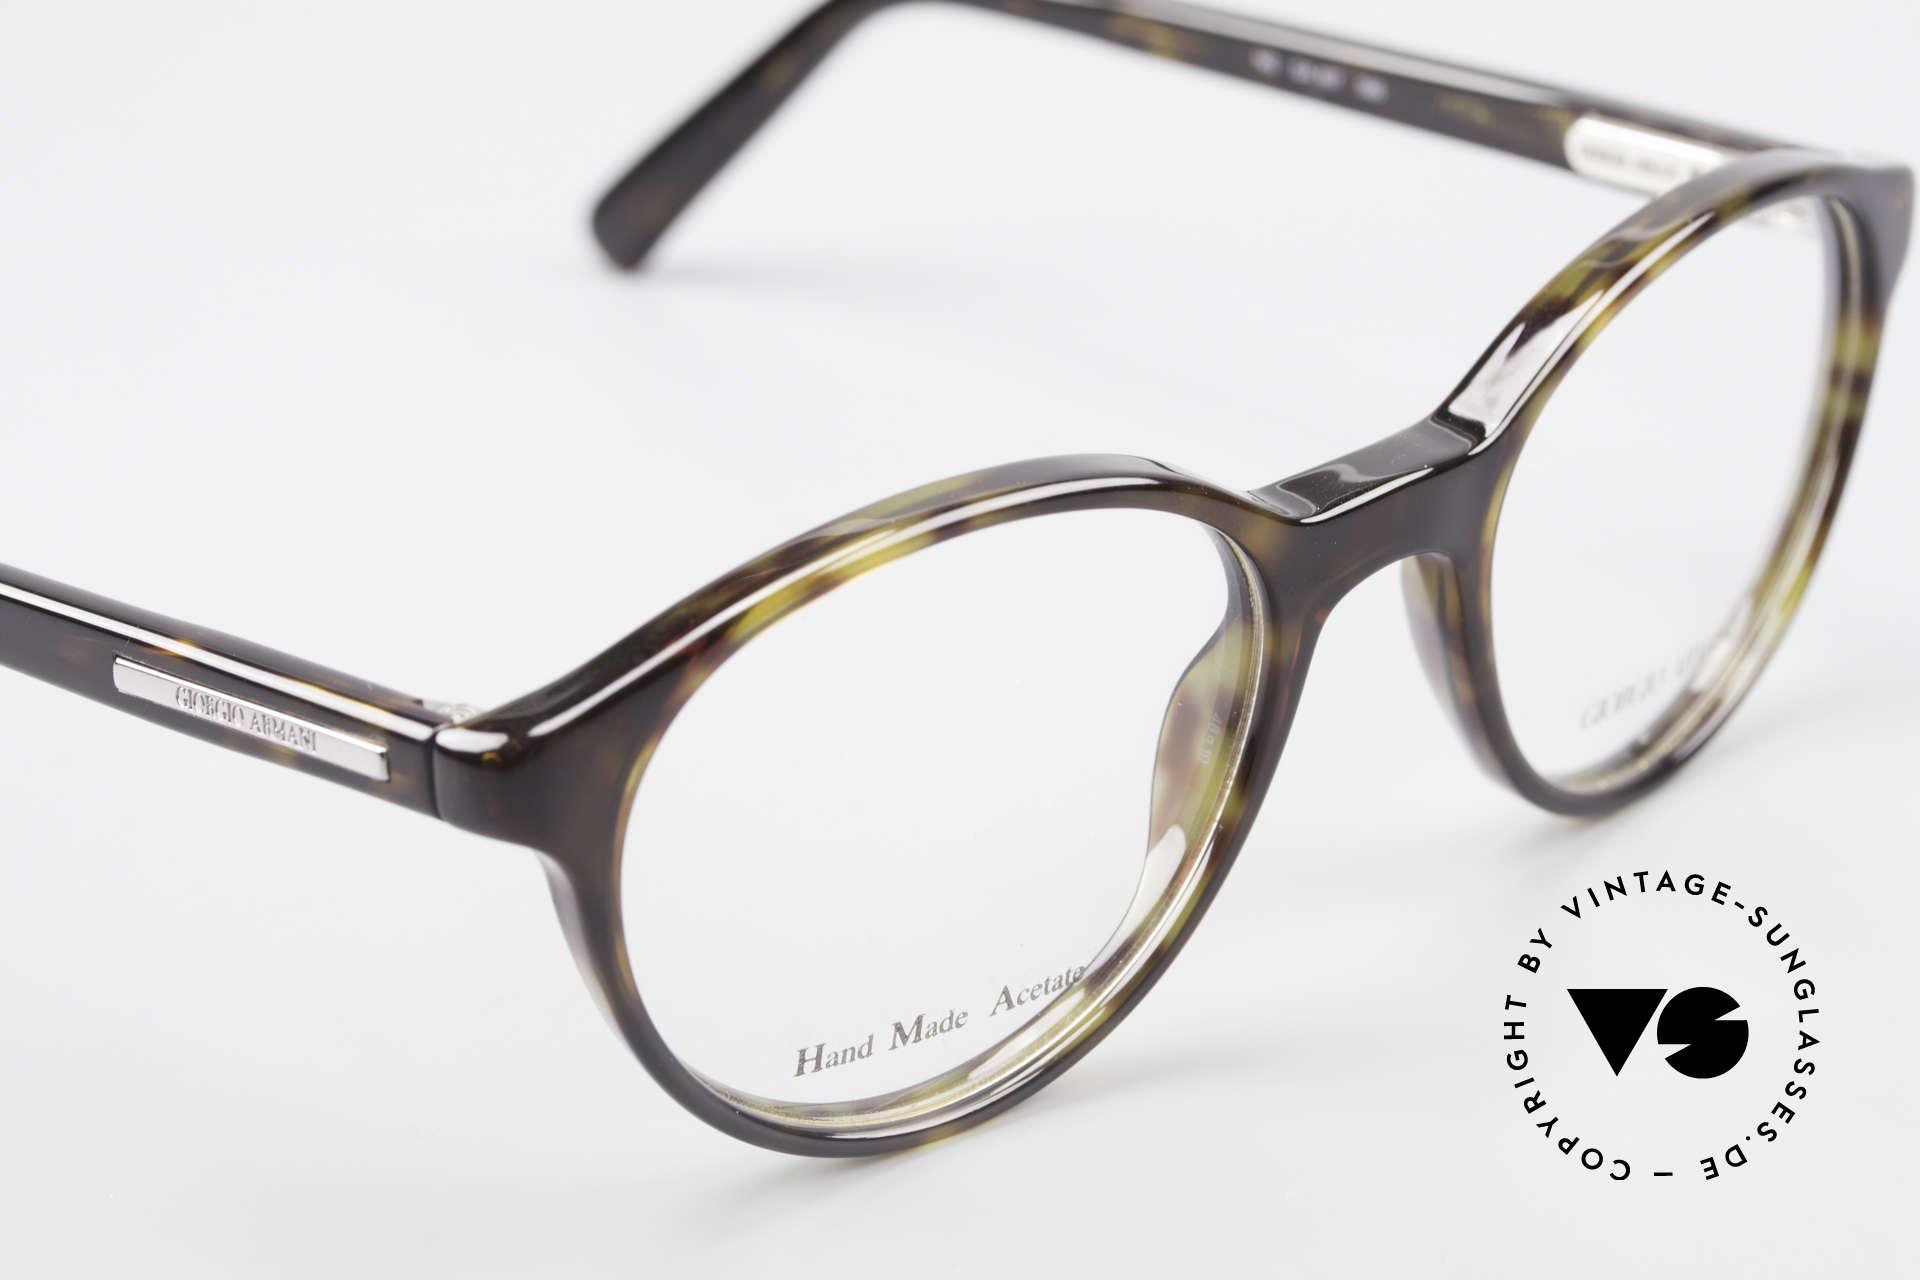 Giorgio Armani 467 Unisex Panto Eyeglass-Frame, unworn (like all our vintage Giorgio Armani specs), Made for Men and Women